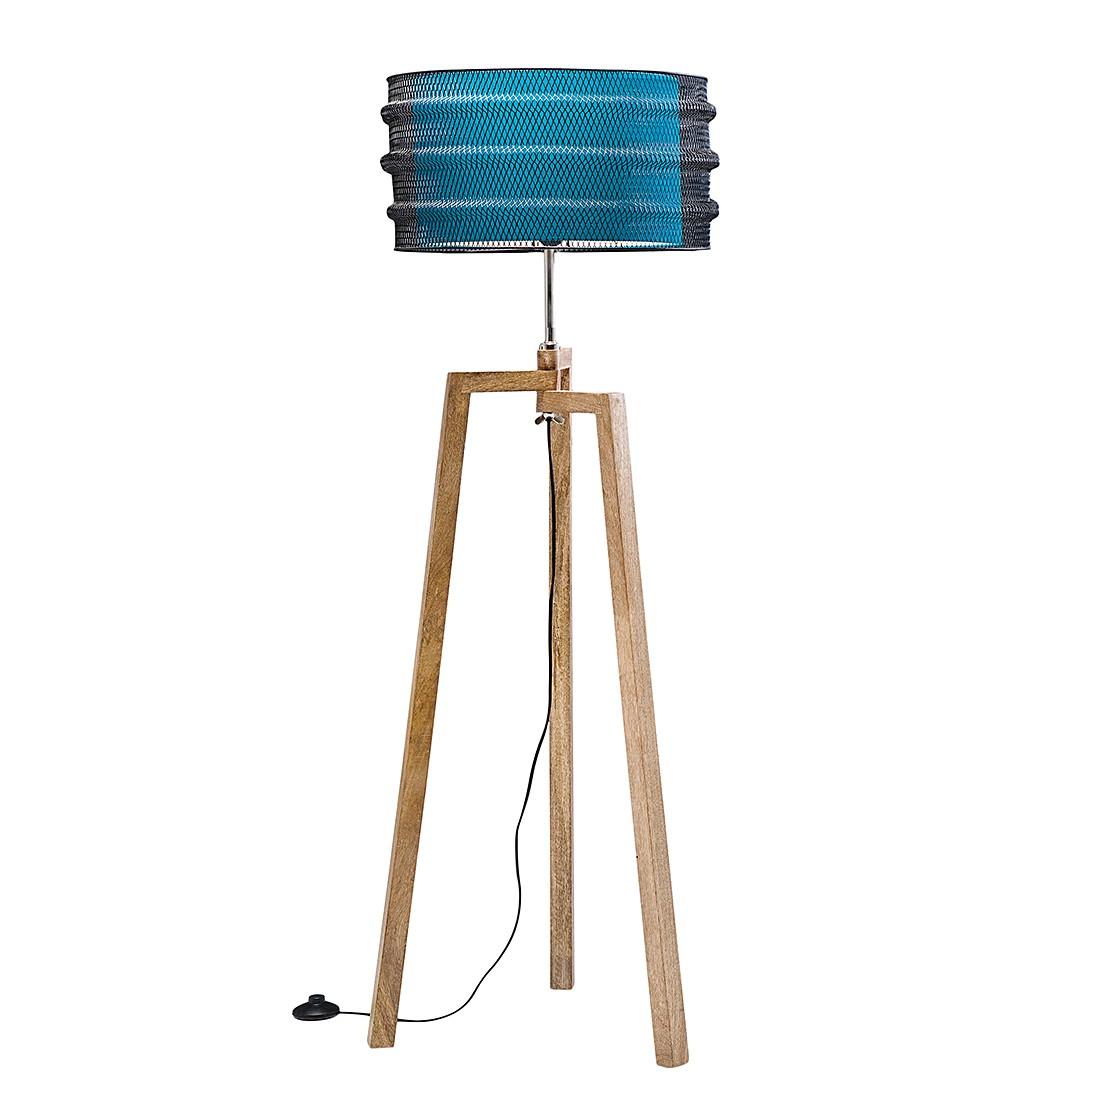 EEK A++, Lampadaire Wire Tripod - Manguier / Coton / Fer, Kare Design